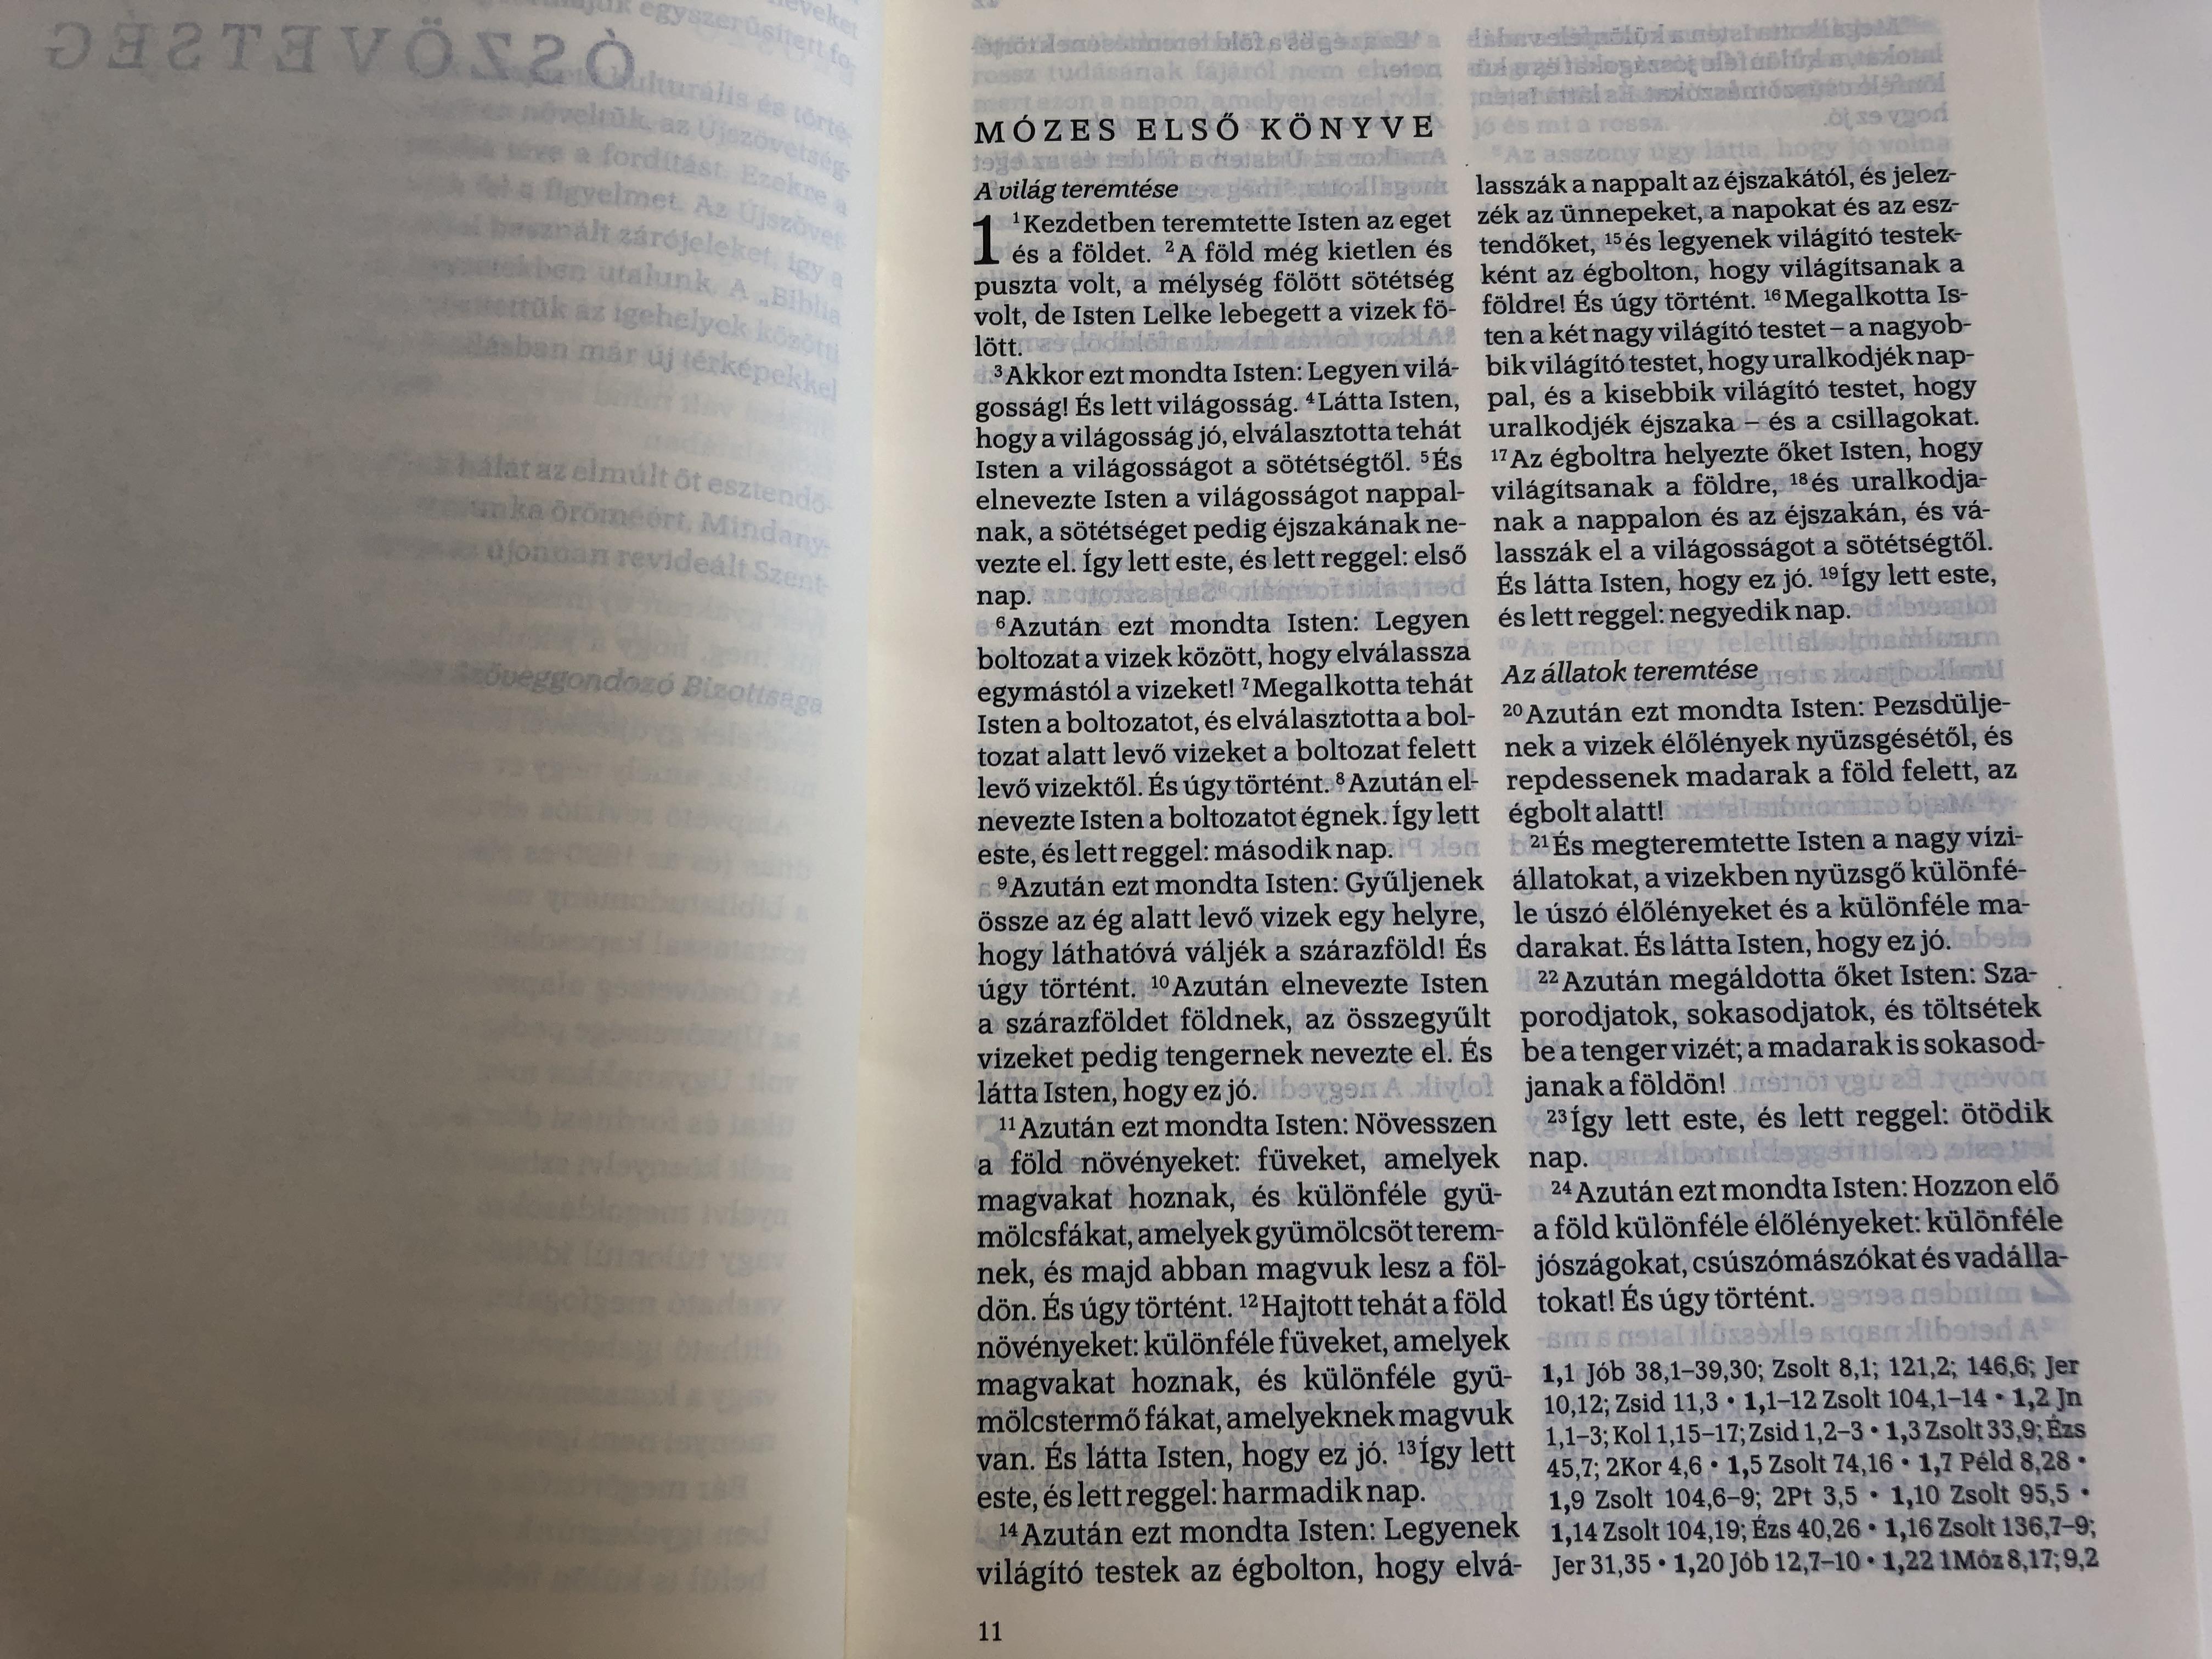 biblia-istennek-az-sz-vets-gben-s-jsz-vets-gben-adott-kijelent-se-r-f-2014-hungarian-language-bible-revised-translation-2020-hardcover-k-lvin-kiad-2018-blue-black-mid-size.jpg